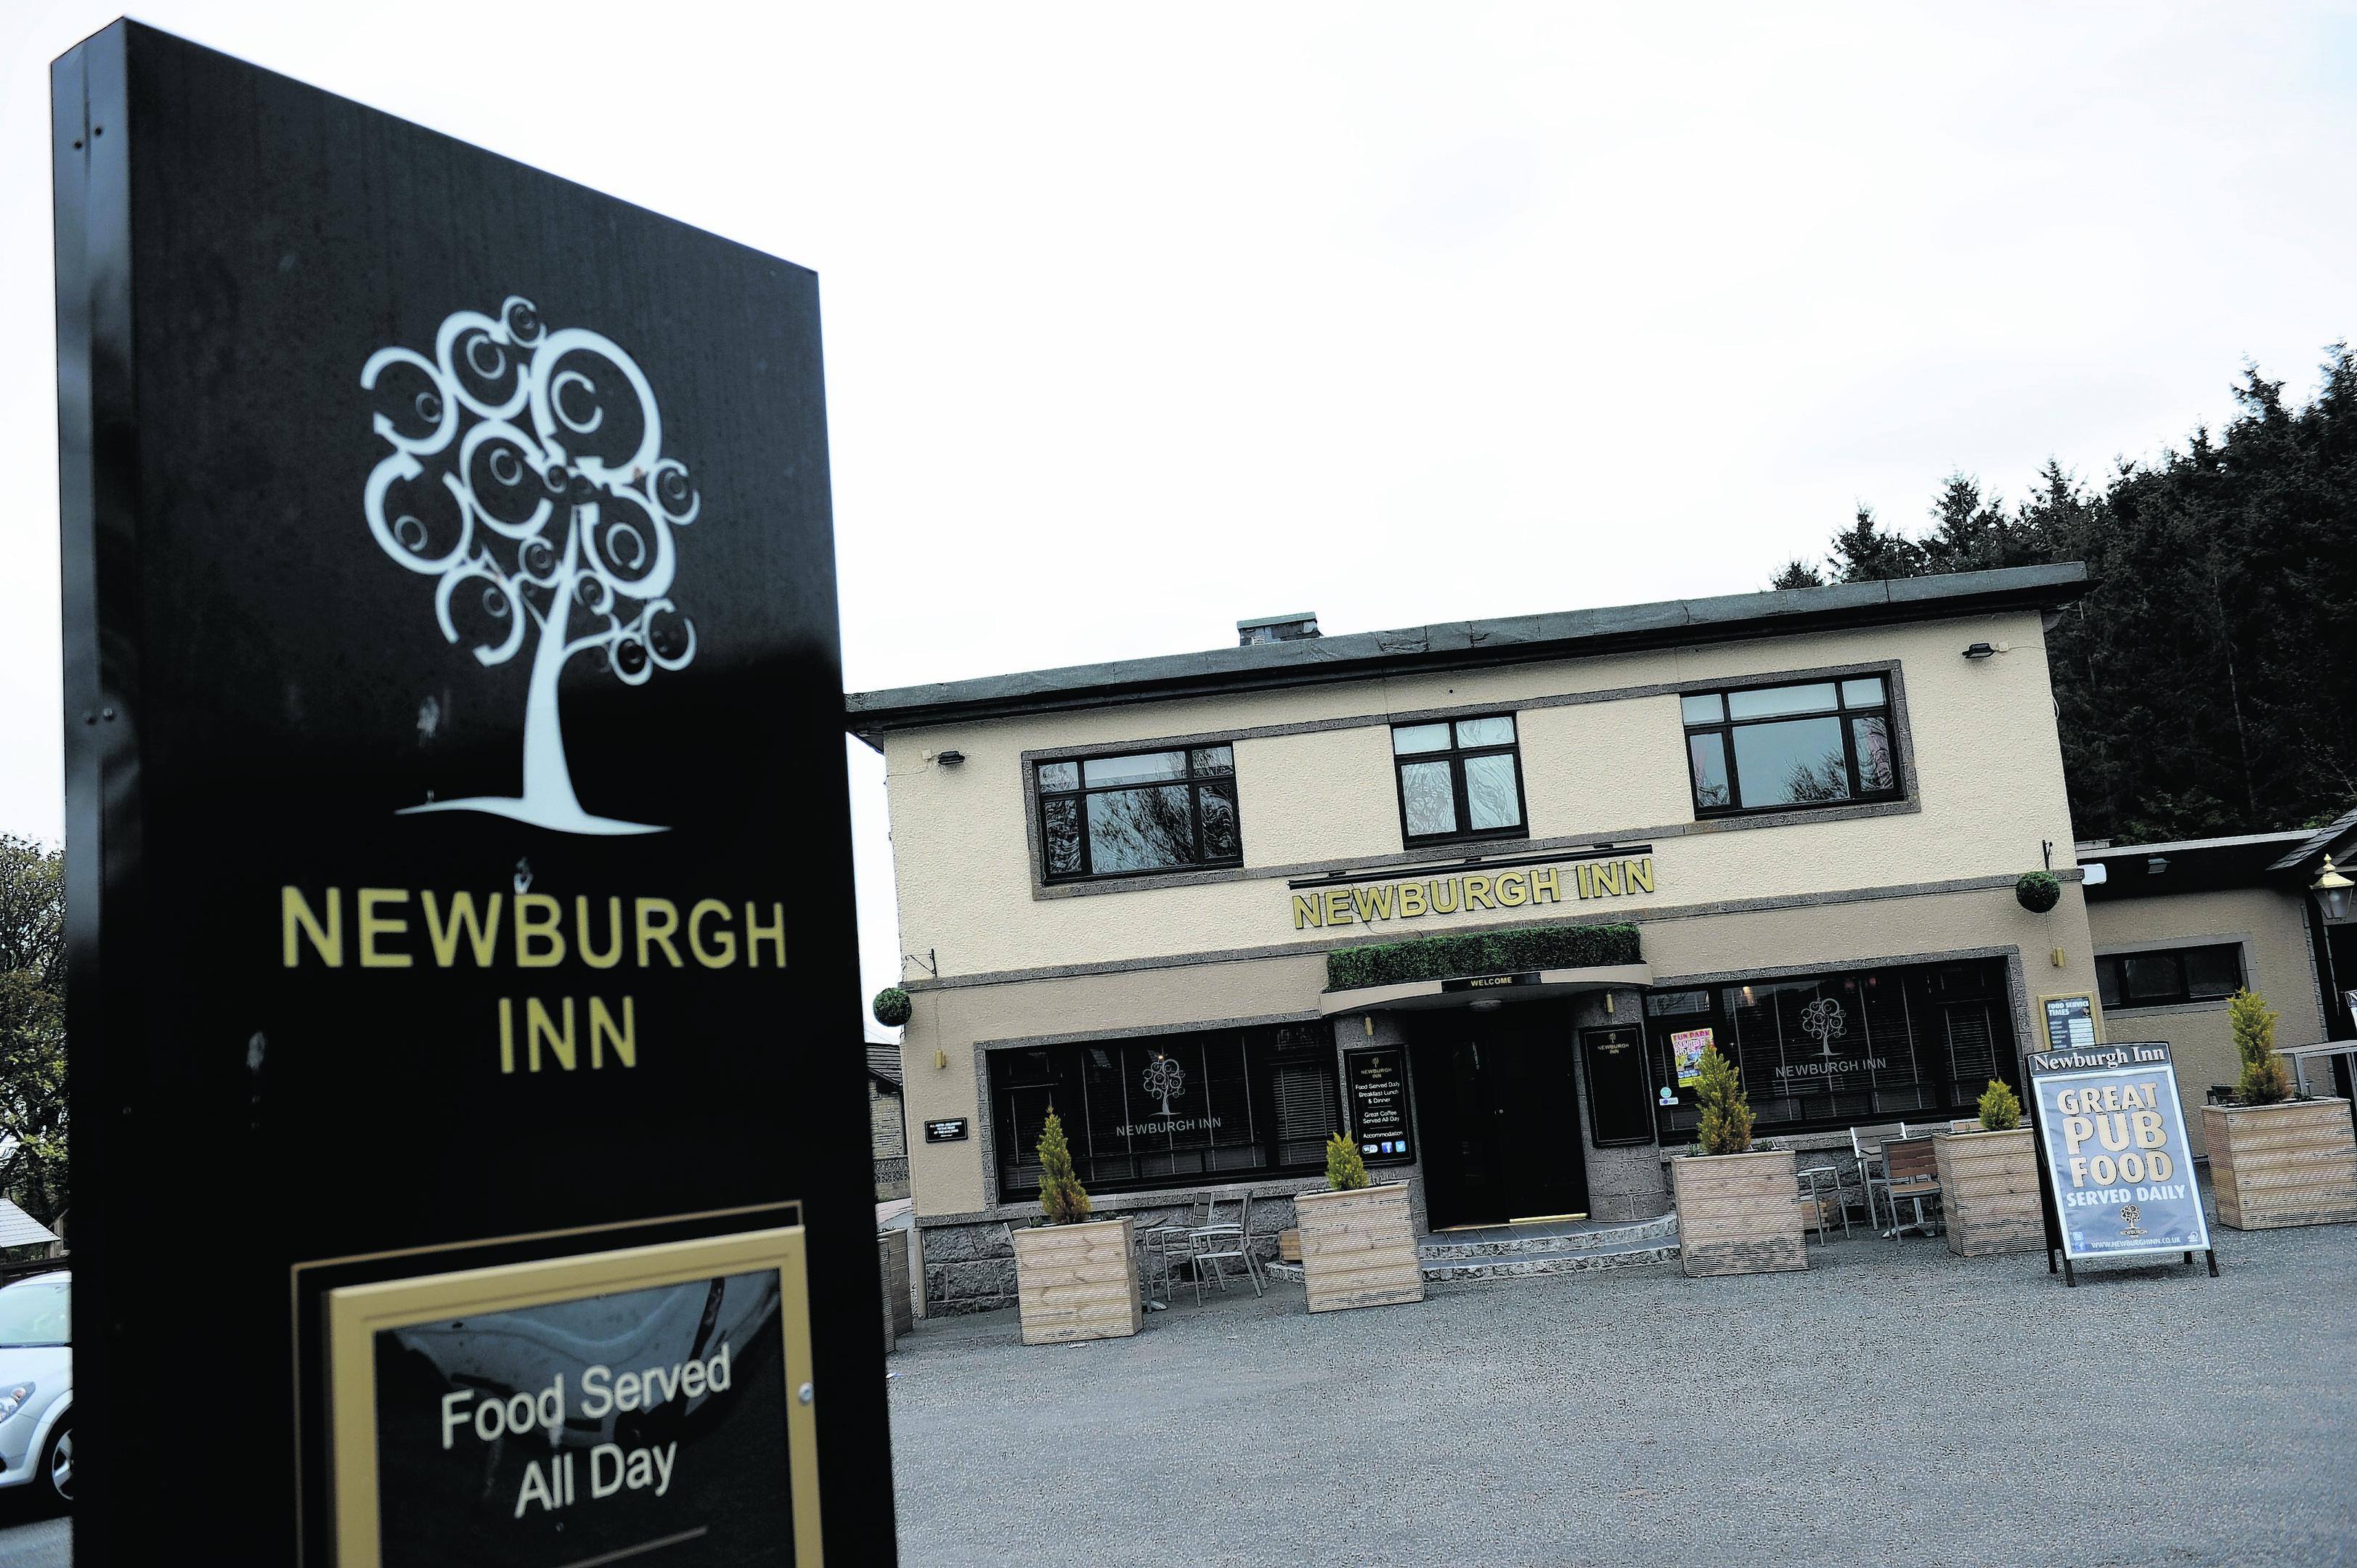 Newburgh Inn, Main Street, Newburgh.